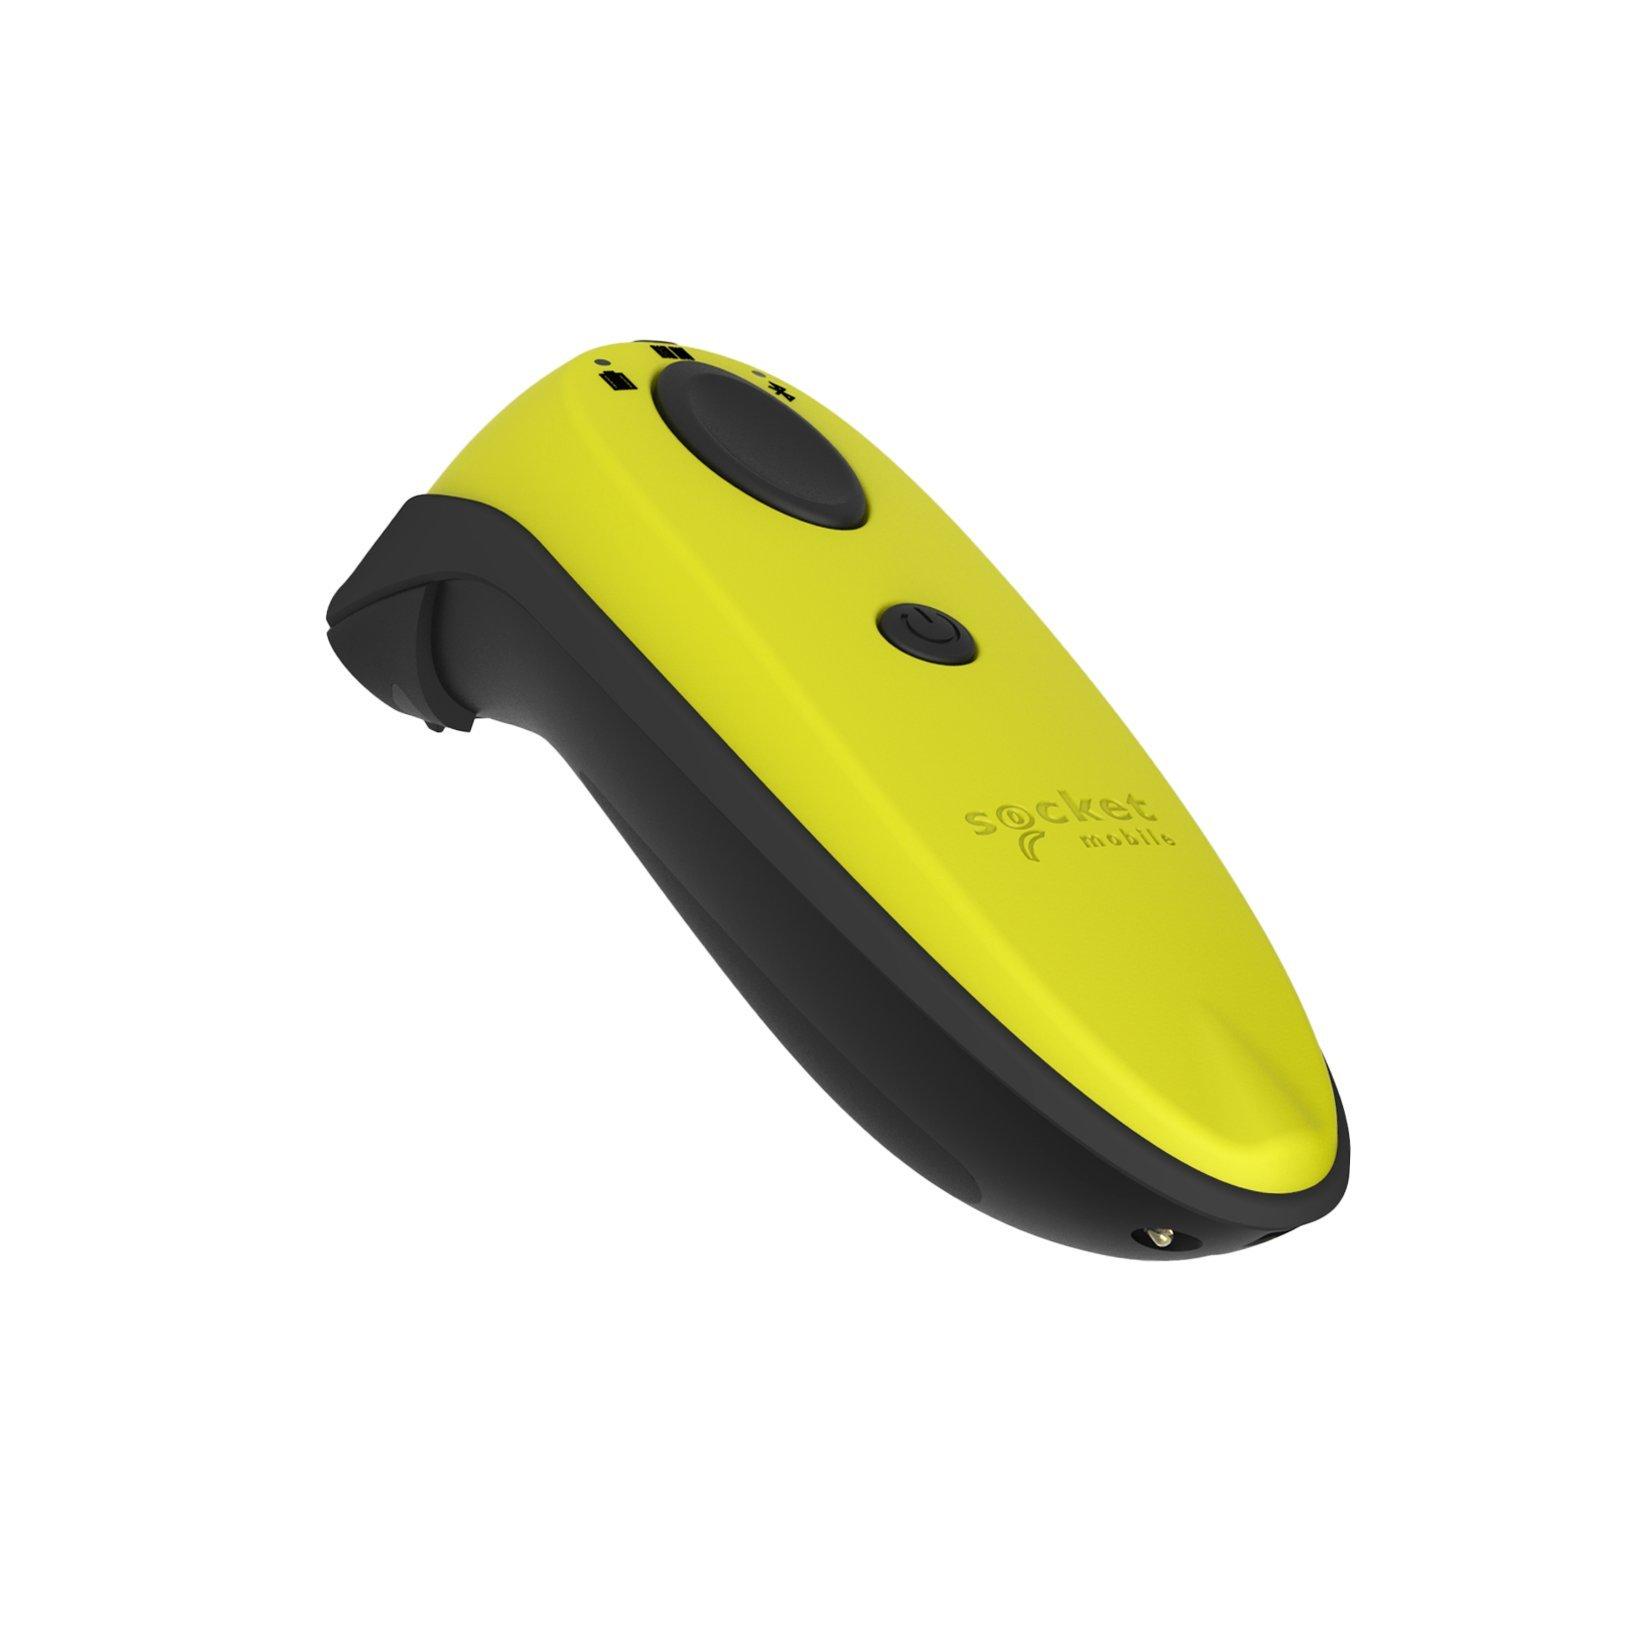 DuraScan D730, 1D Laser Barcode Scanner, Neon Green by Socket Mobile